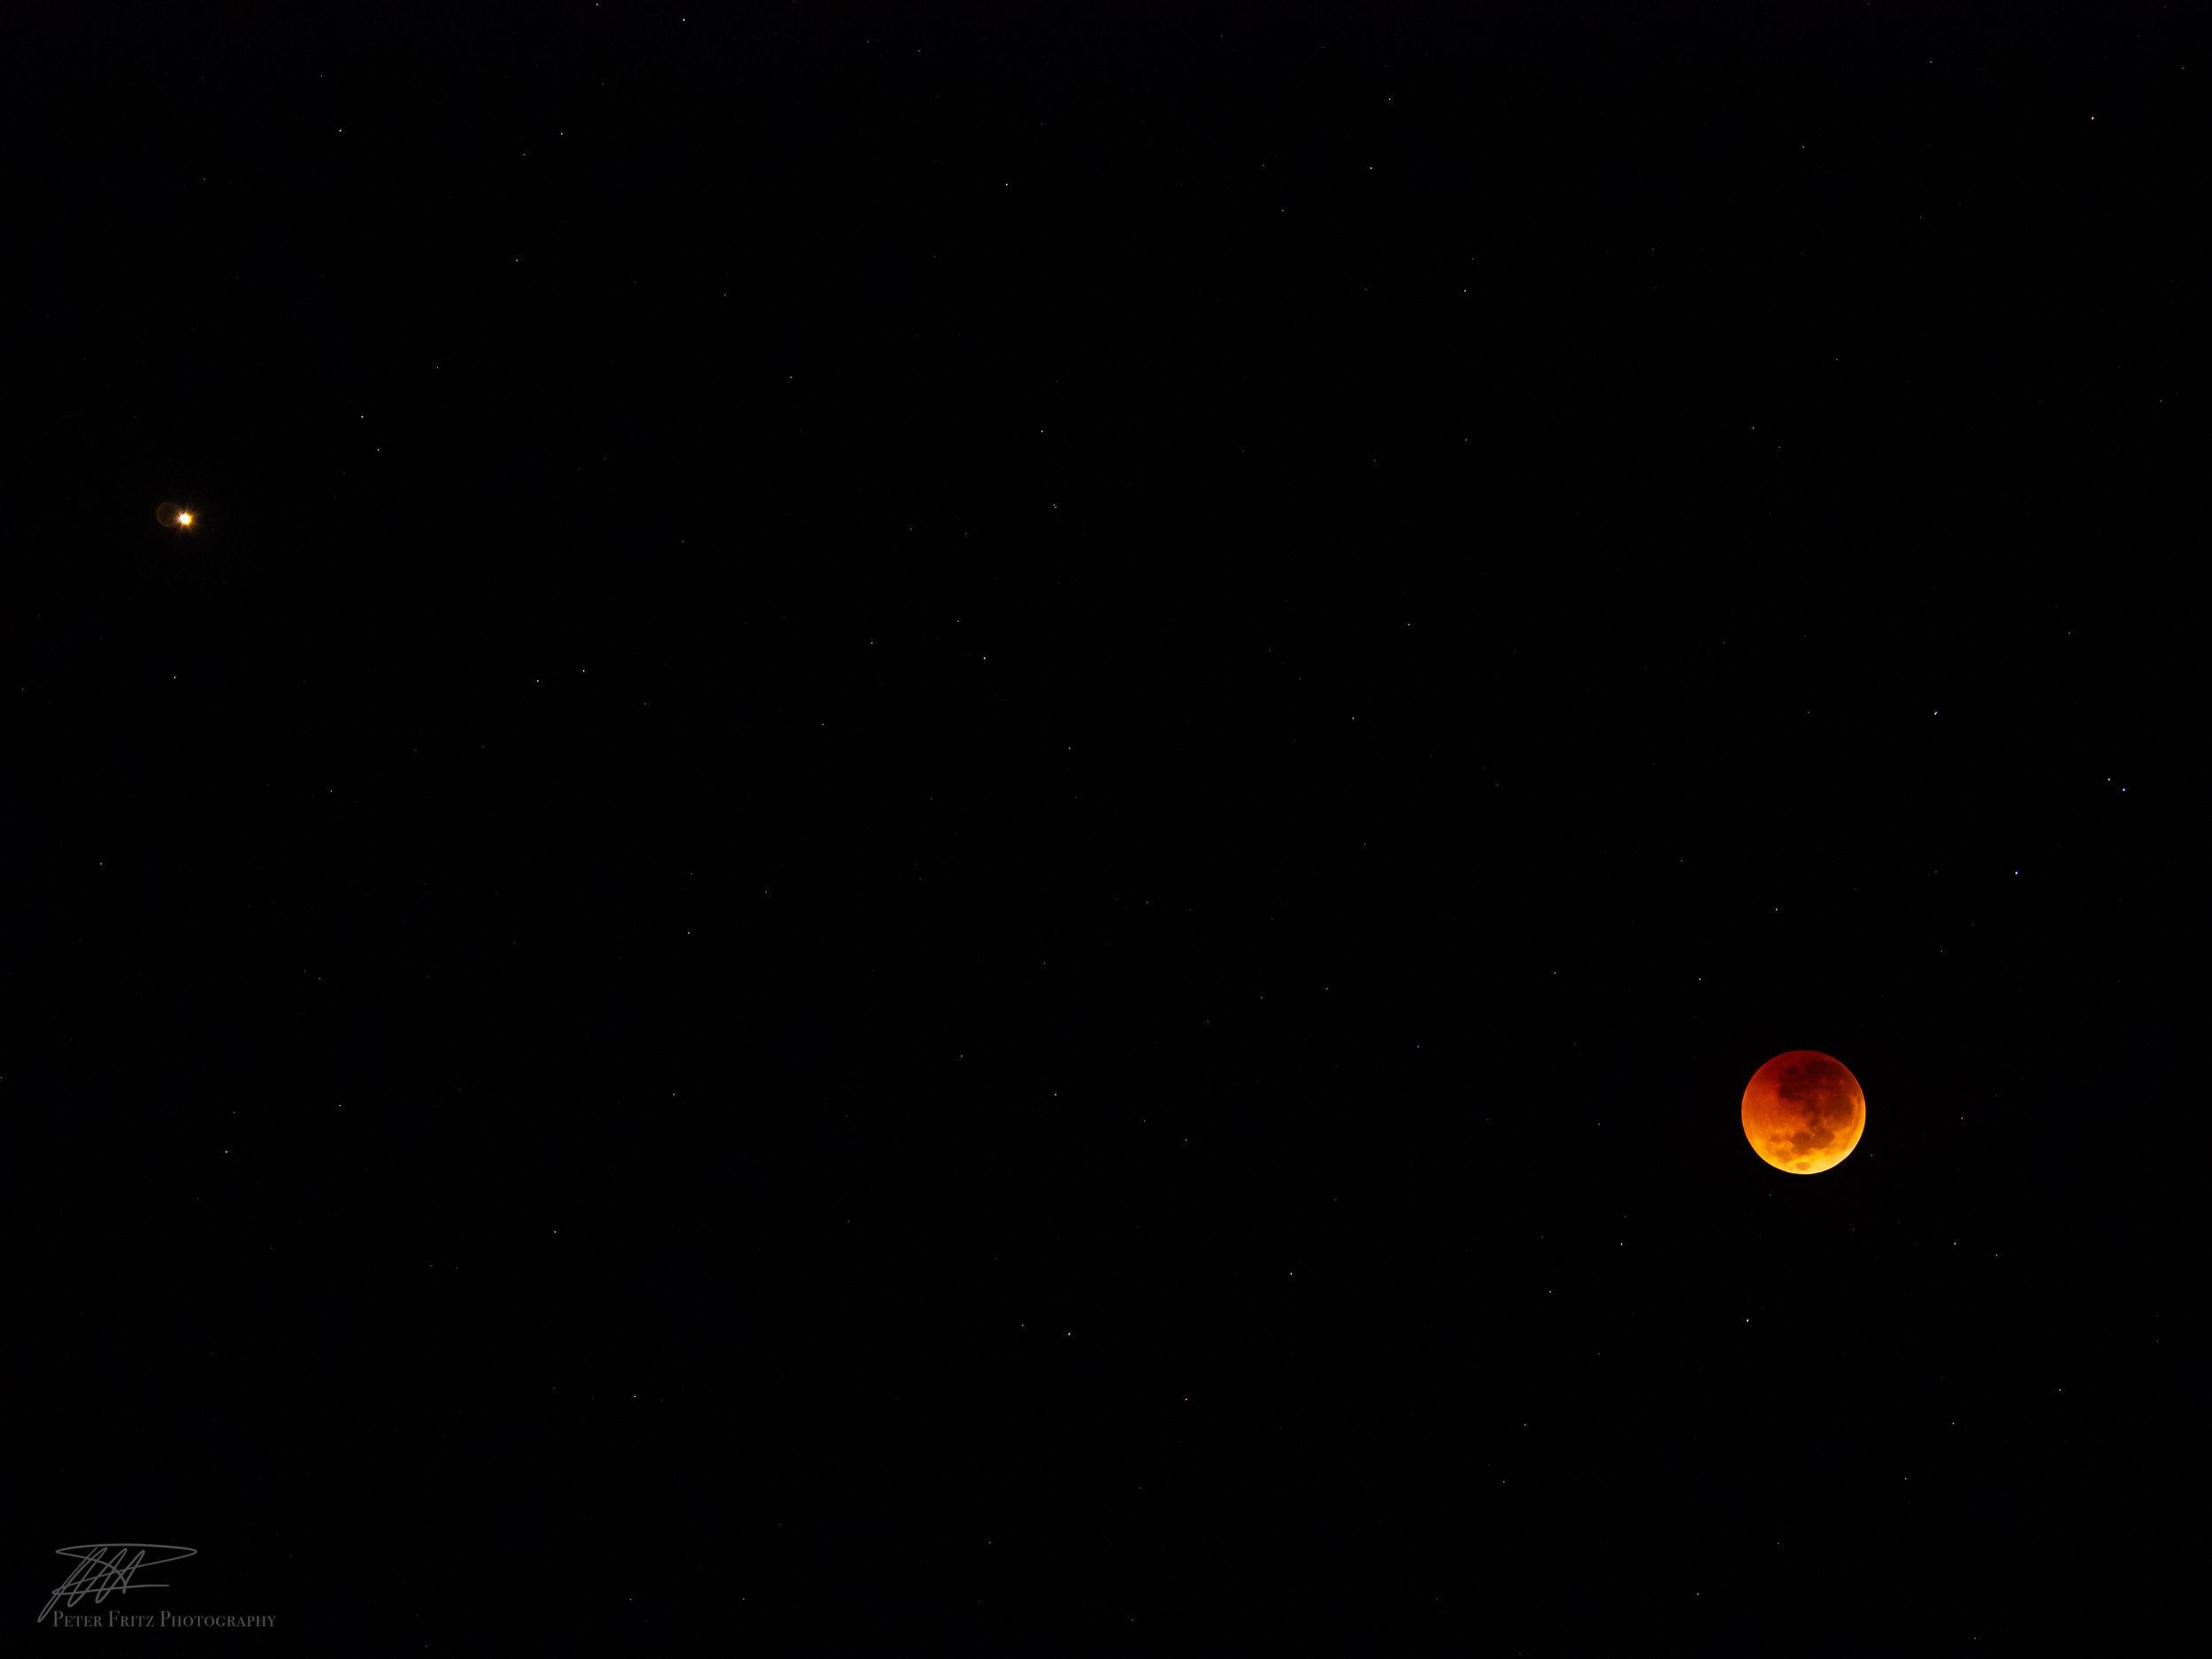 Moon and Mars 4x3jpg.jpg